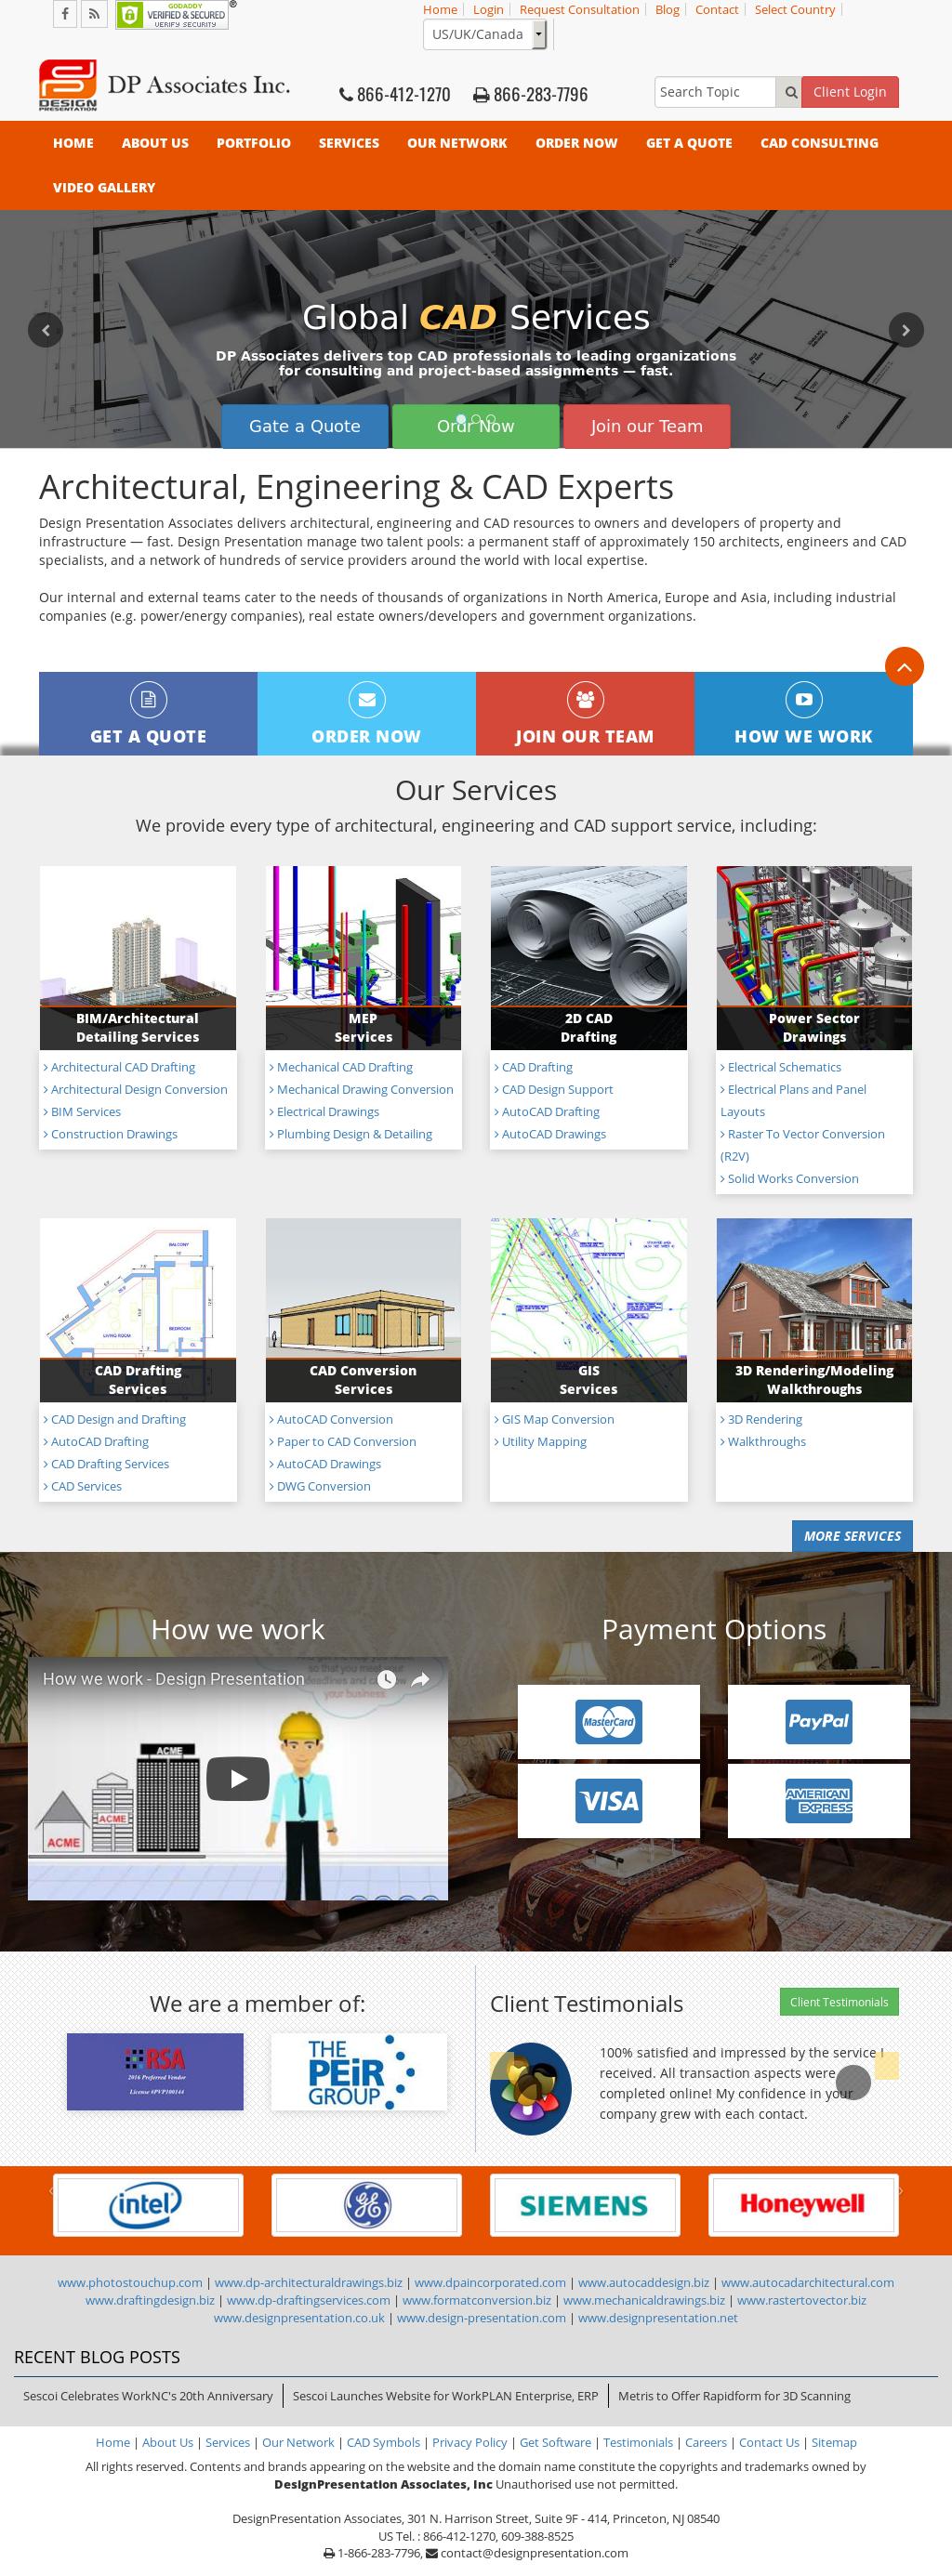 Designpresentation Associates Competitors, Revenue and